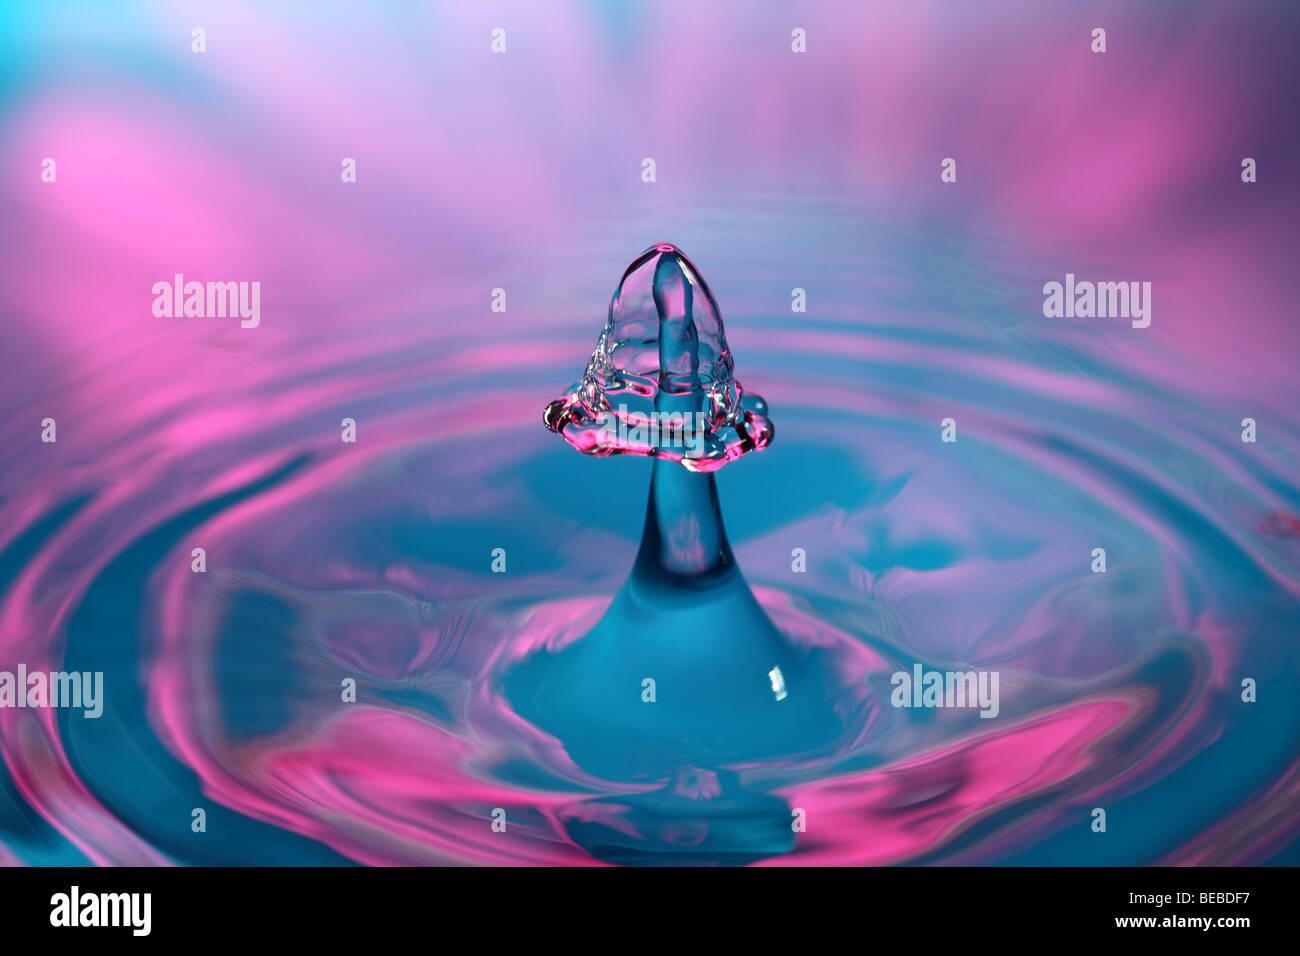 Water Drip - Stock Image